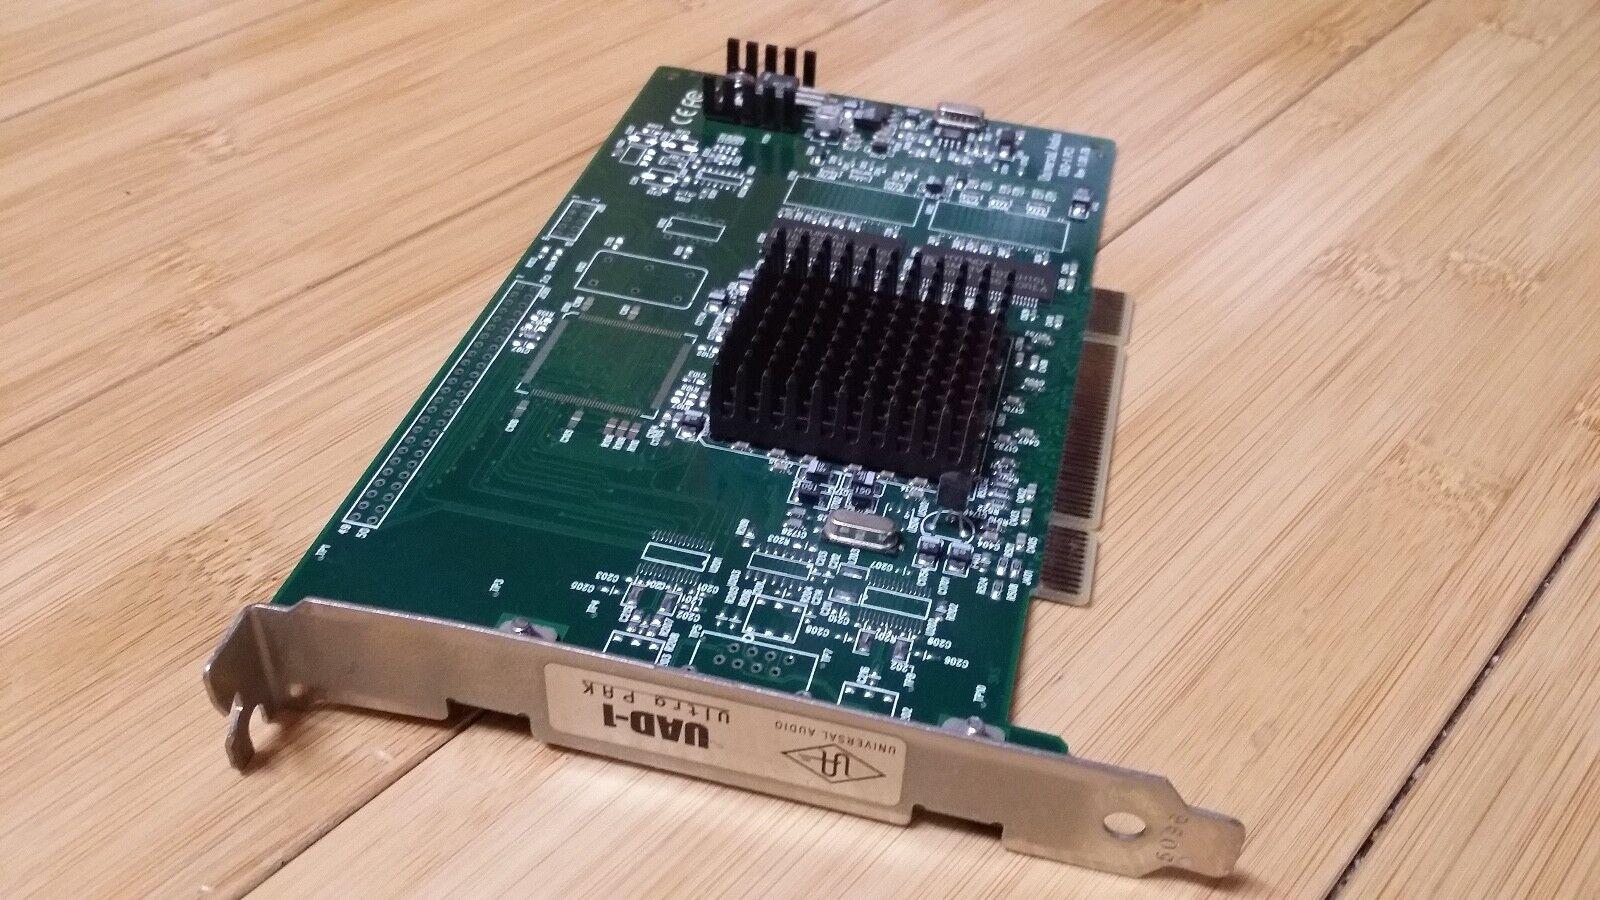 Universal audio UAD-1 ULTRA PAK Card